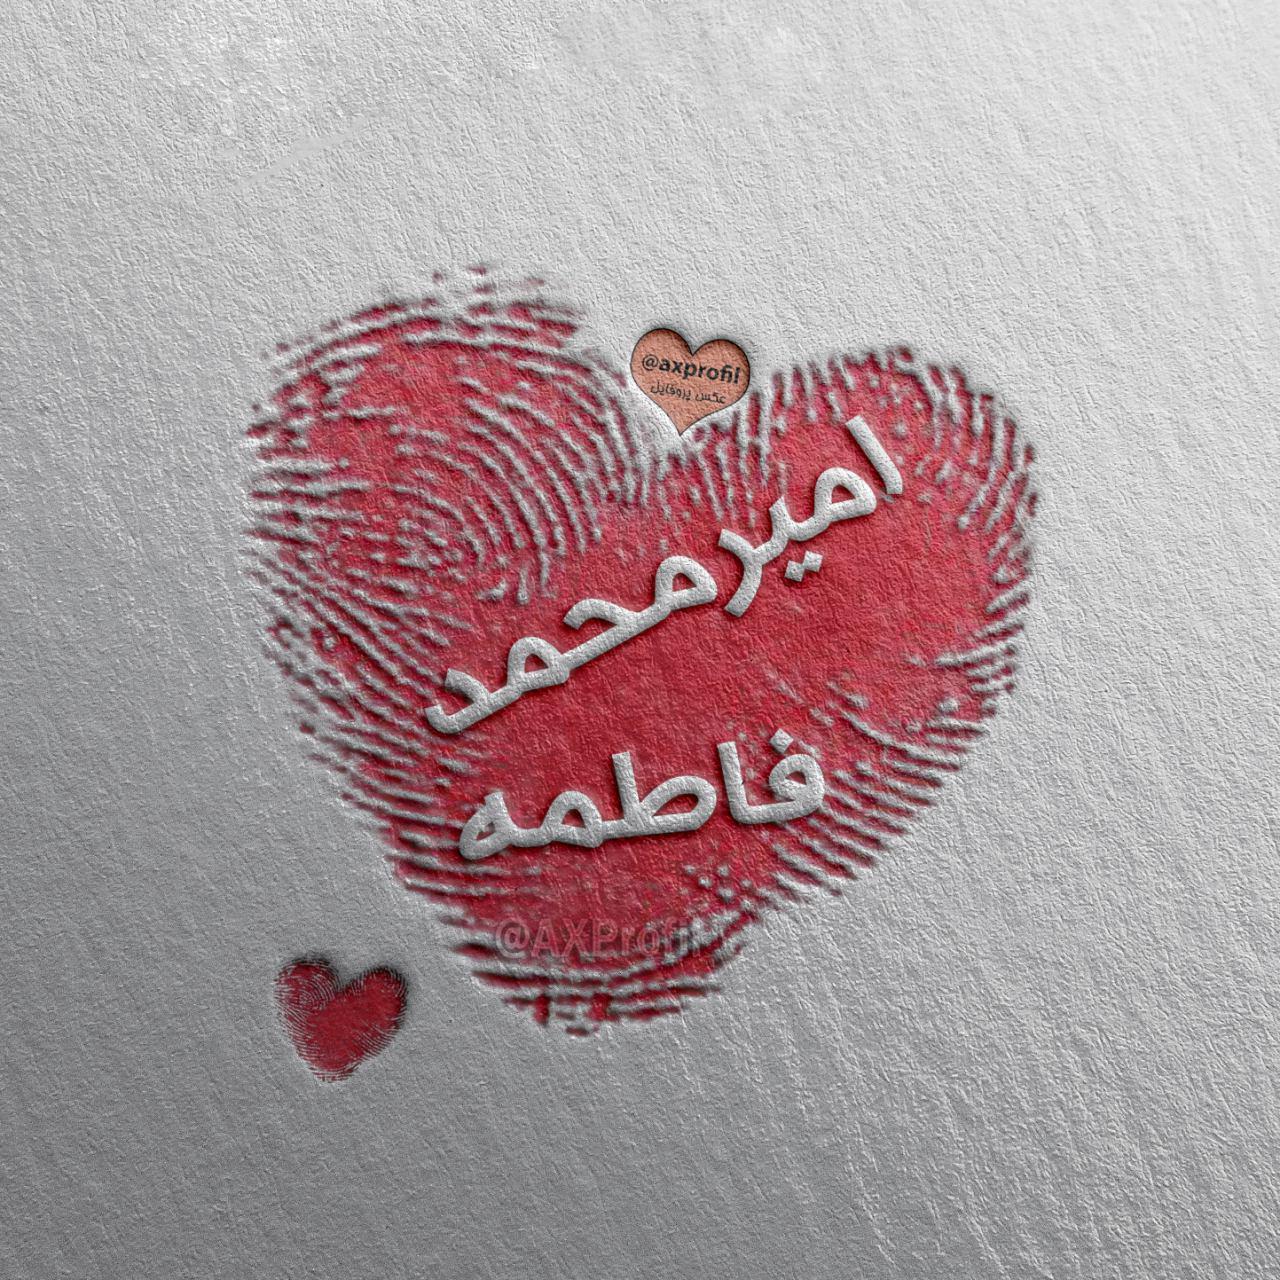 طرح گرافیکی لوگو اسم عاشقانه اسم امیرمحمد و فاطمه